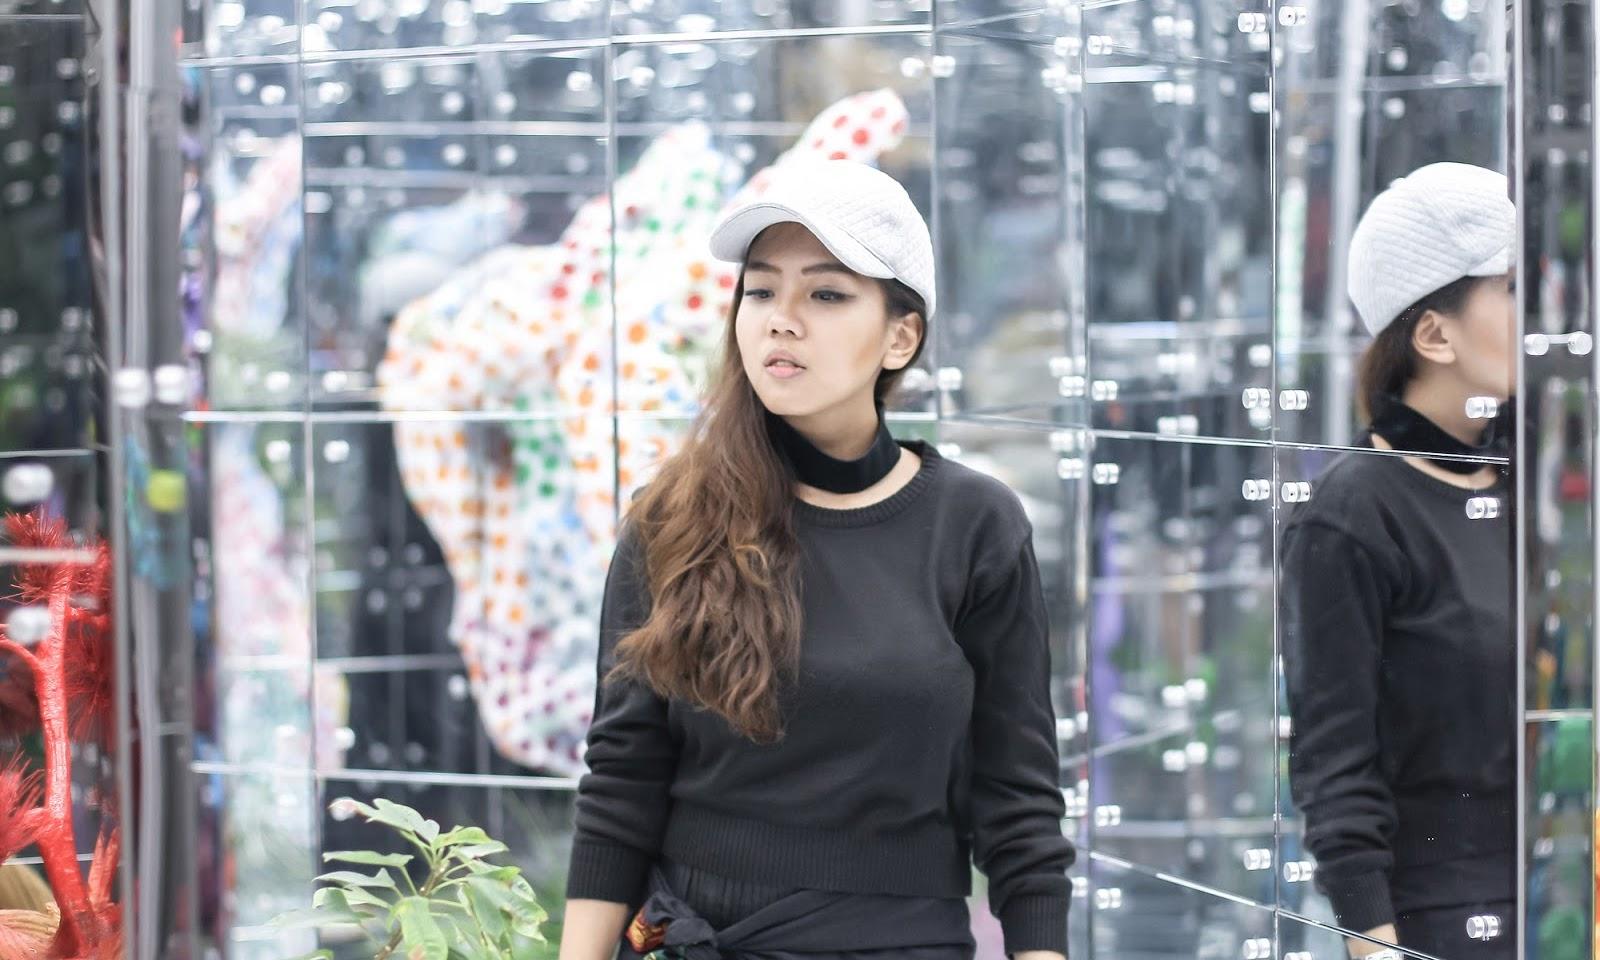 singapore biennale 2016: an atlas of mirrors